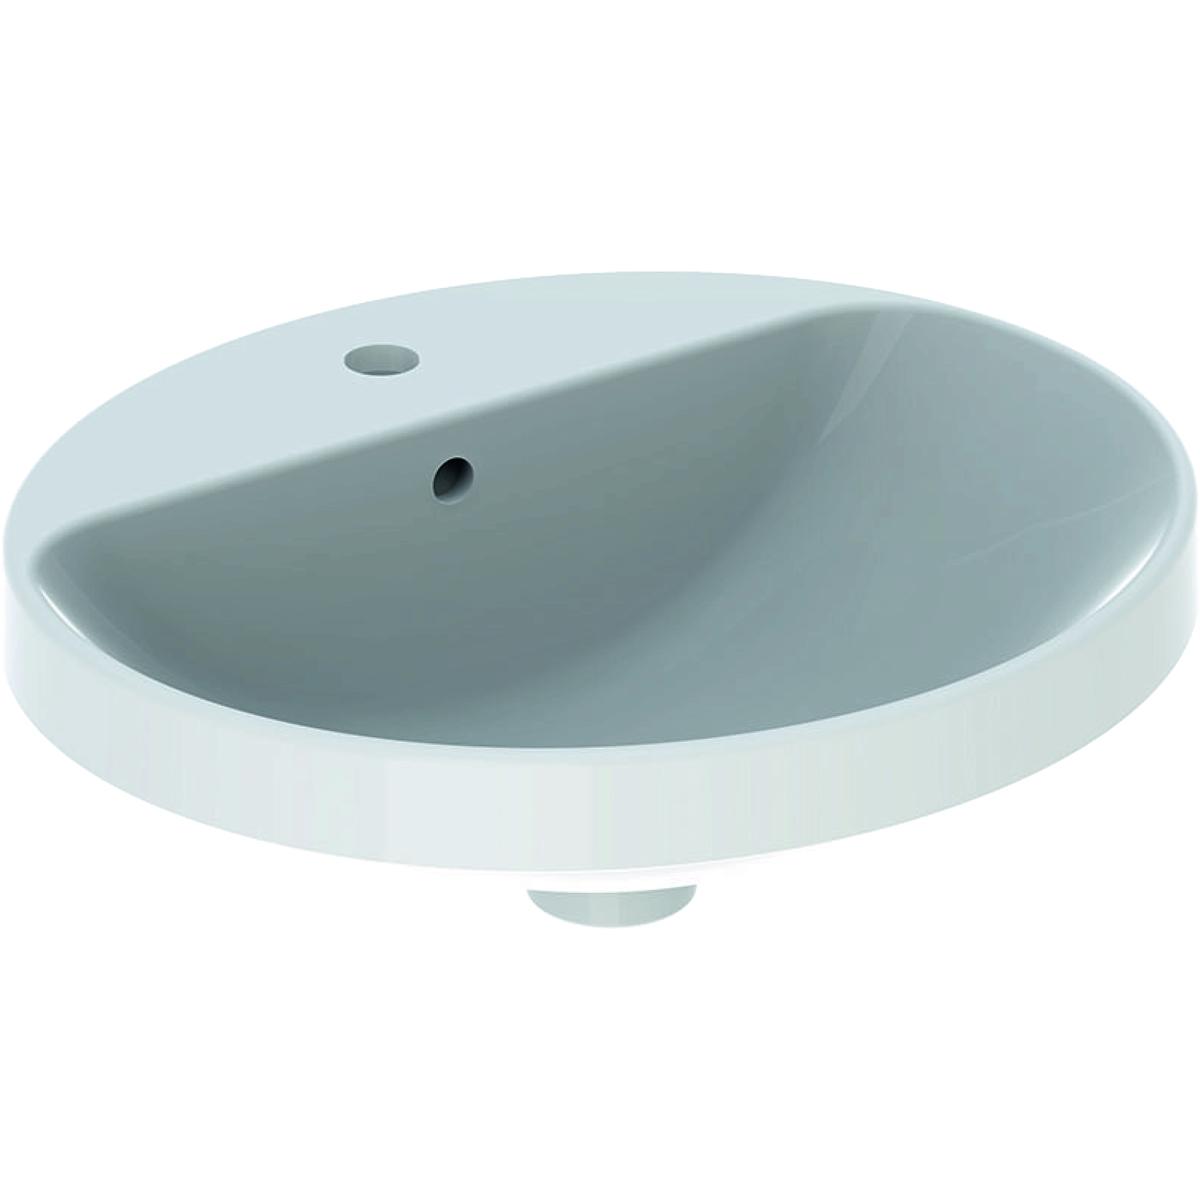 Lavoar oval Geberit VariForm 50x45cm montare in blat alb imagine